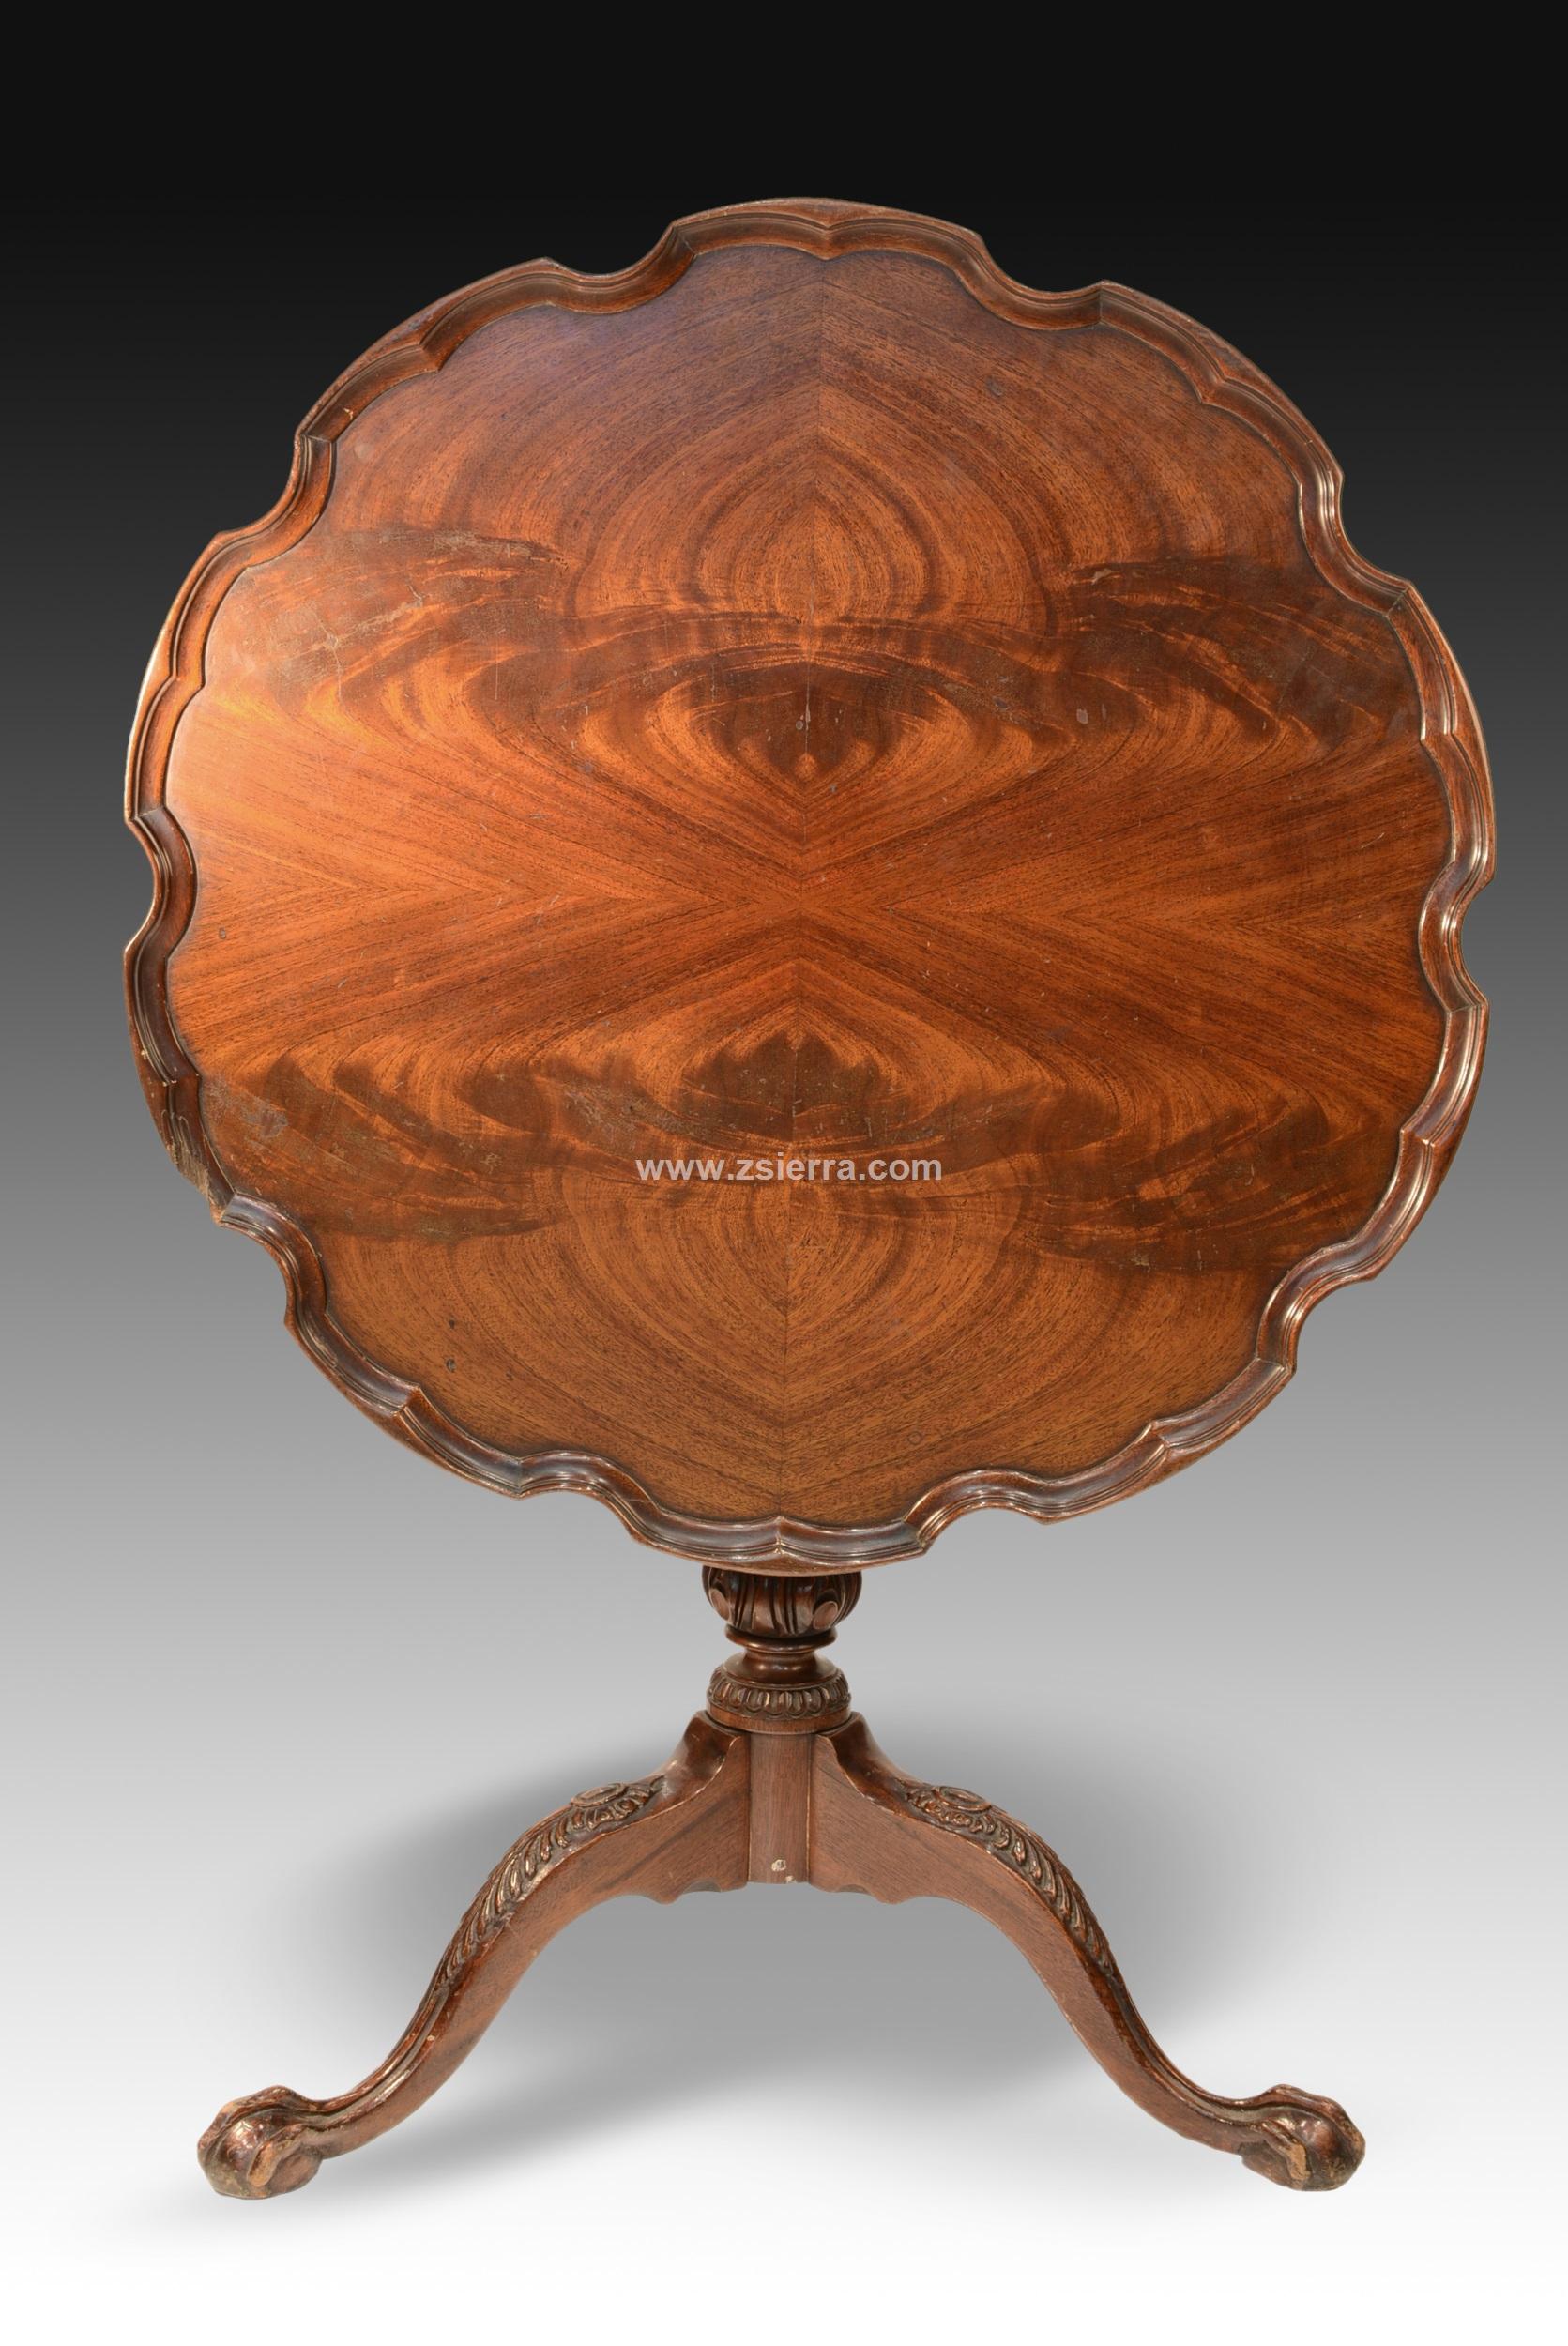 Z sierra antig edades y objetos de decoraci n mesa - Velador plegable ...